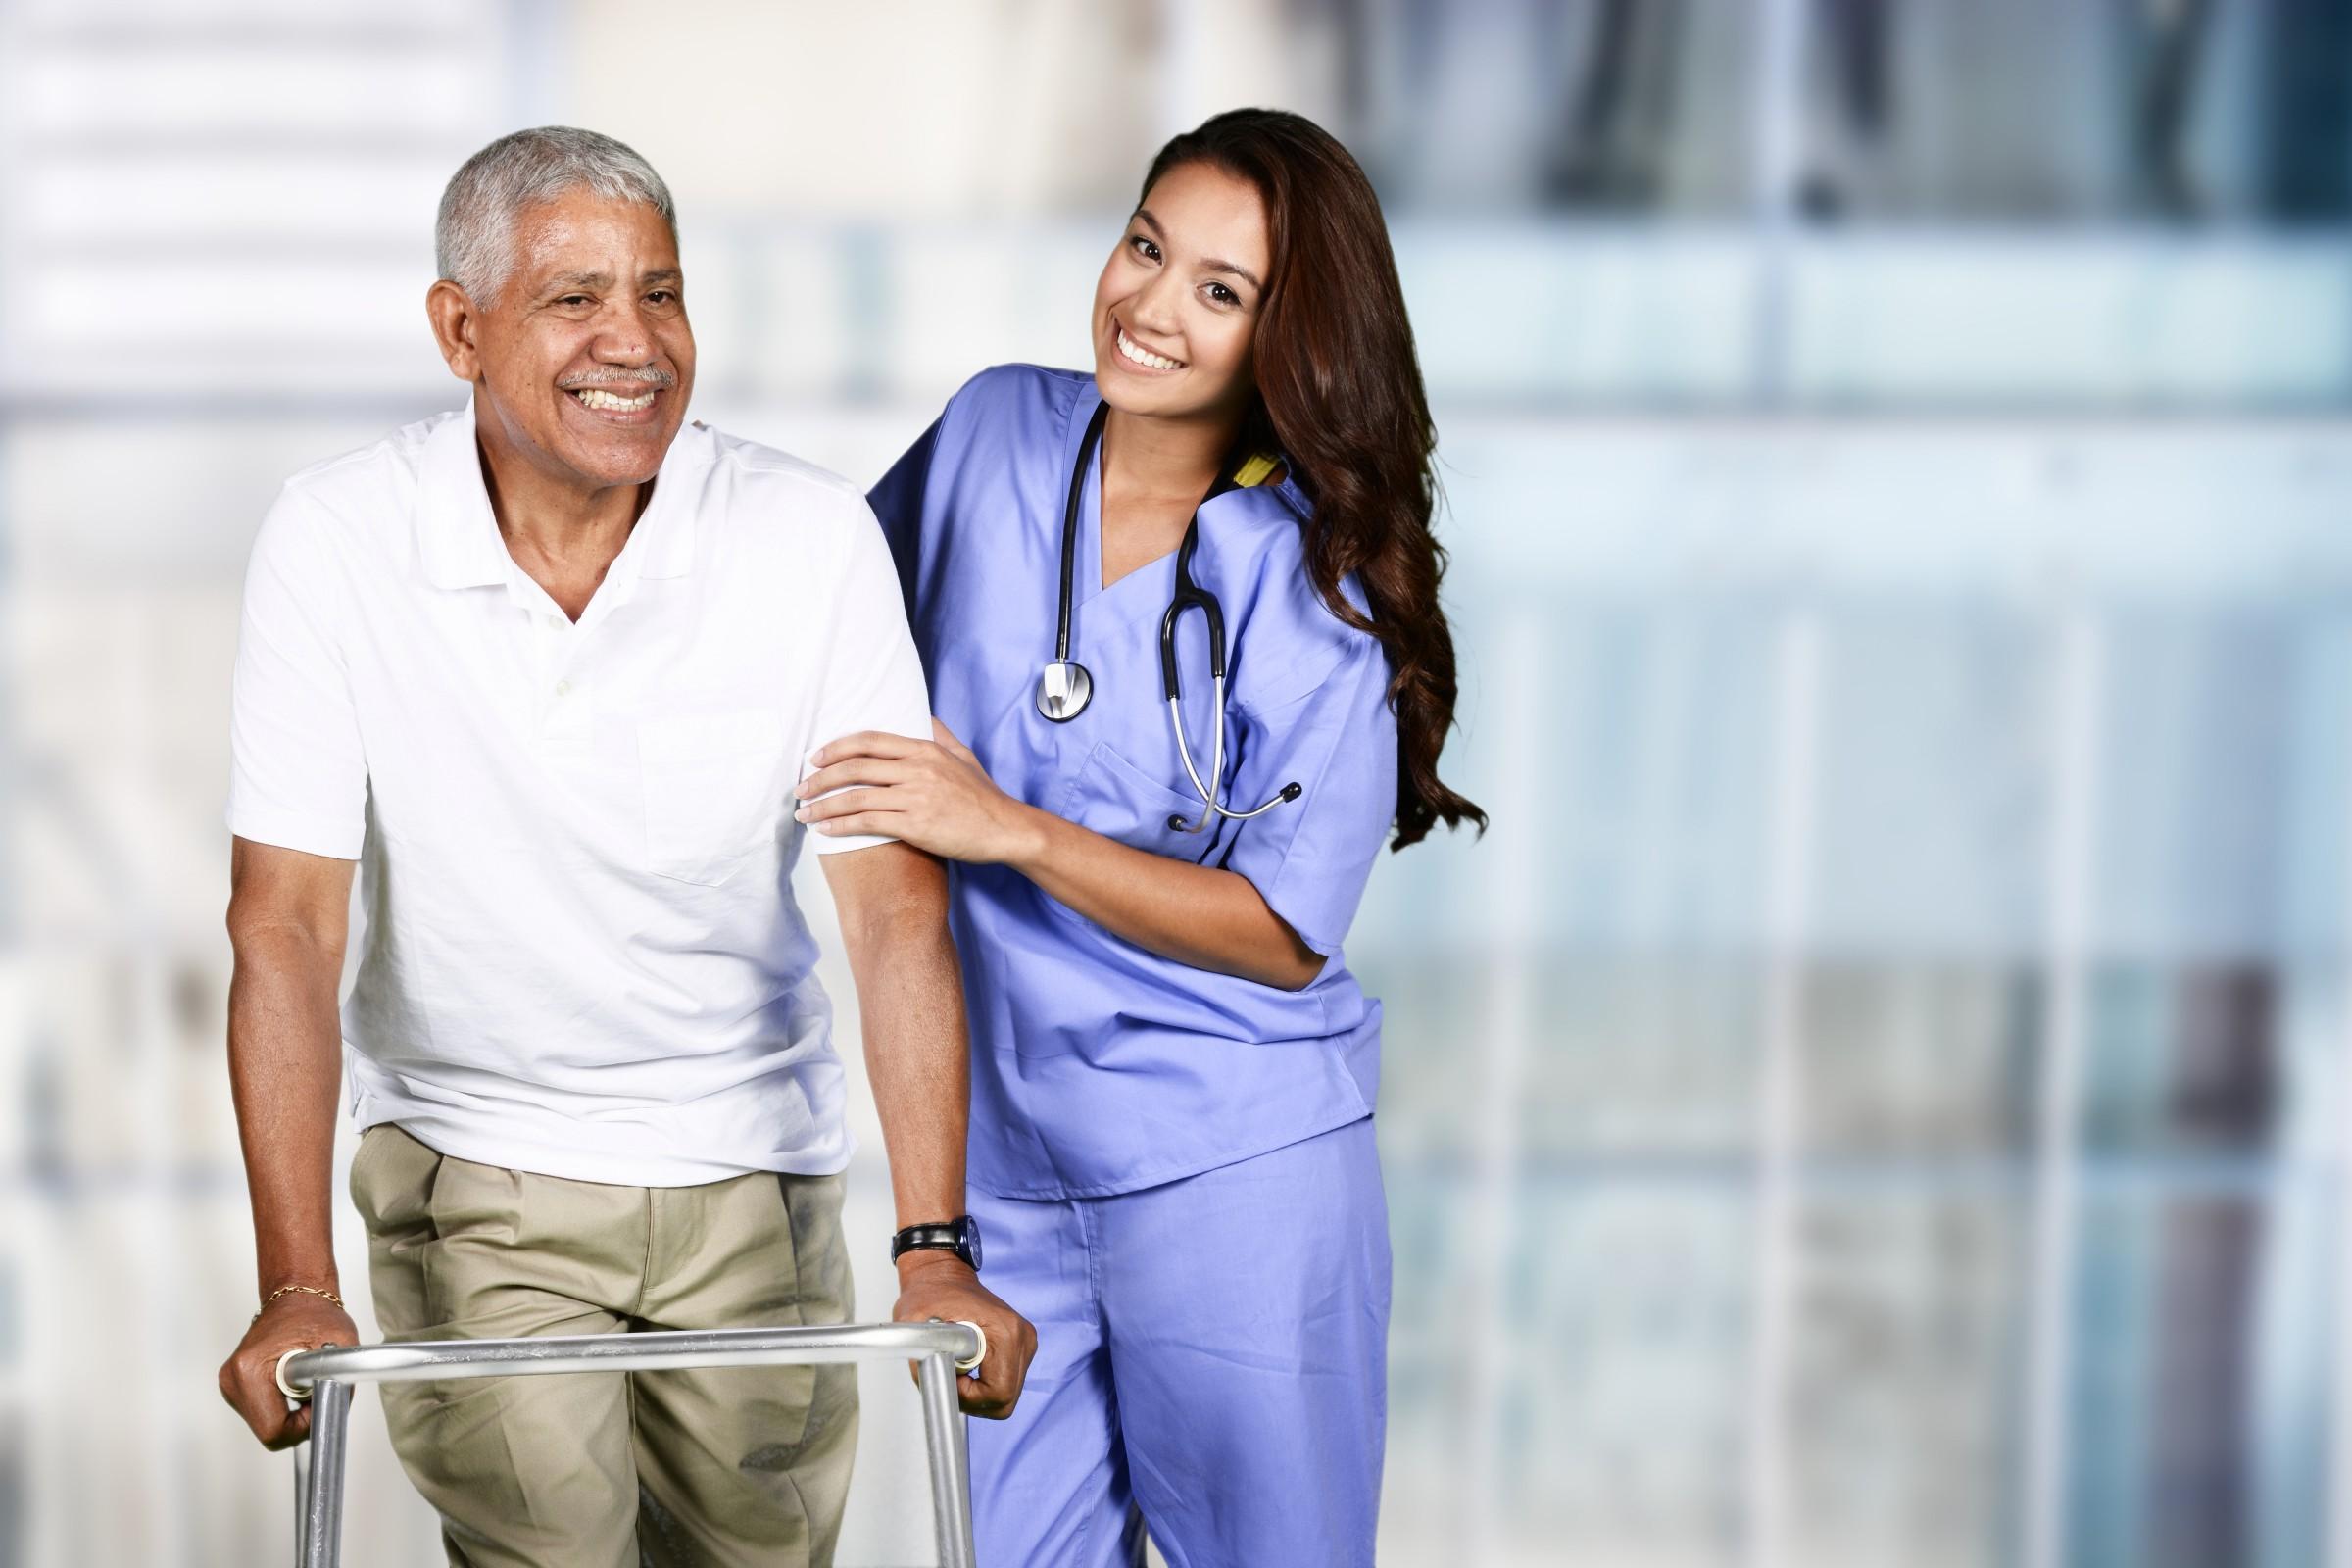 Most popular online courses under healthcare